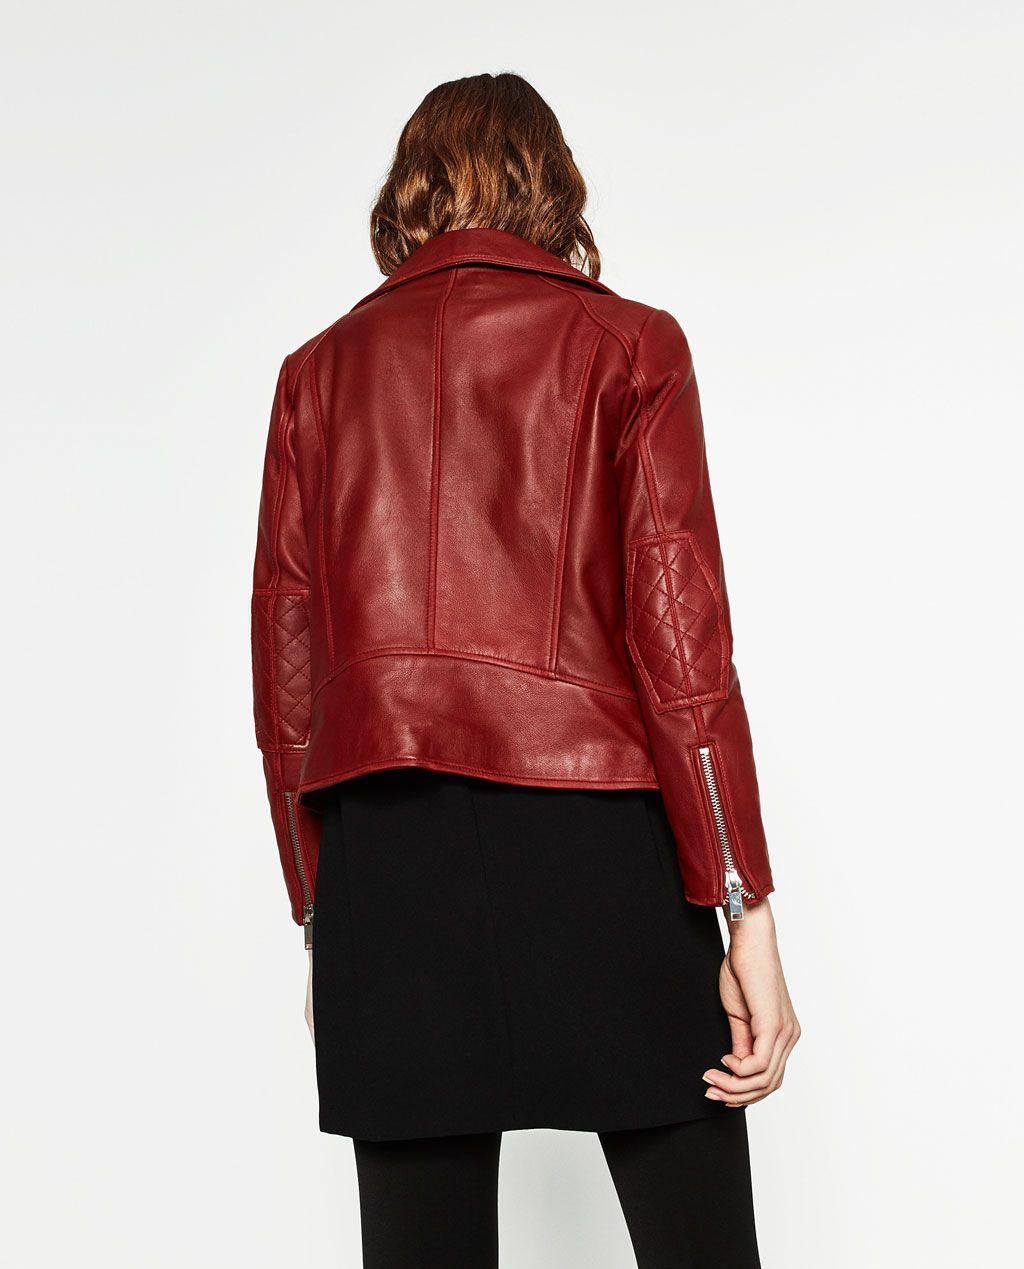 Blouson cuir rouge femme zara